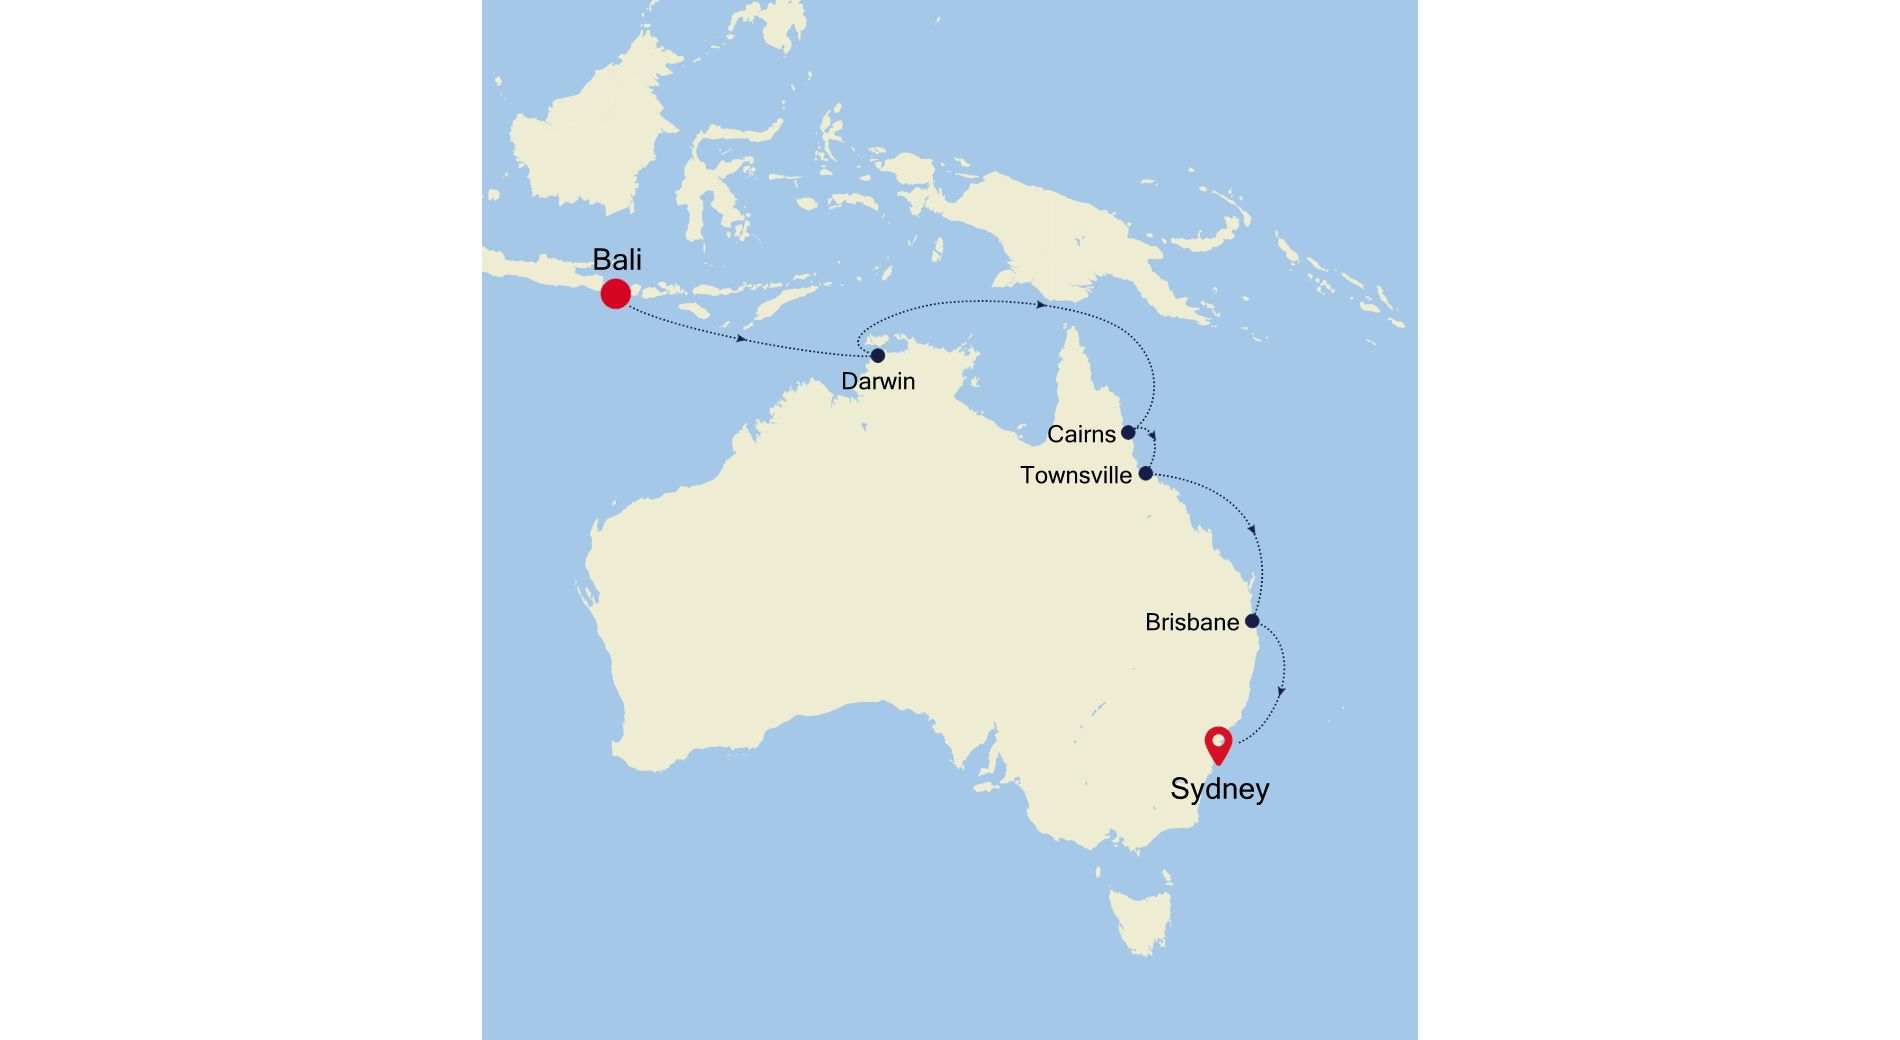 6930B - Bali to Sydney